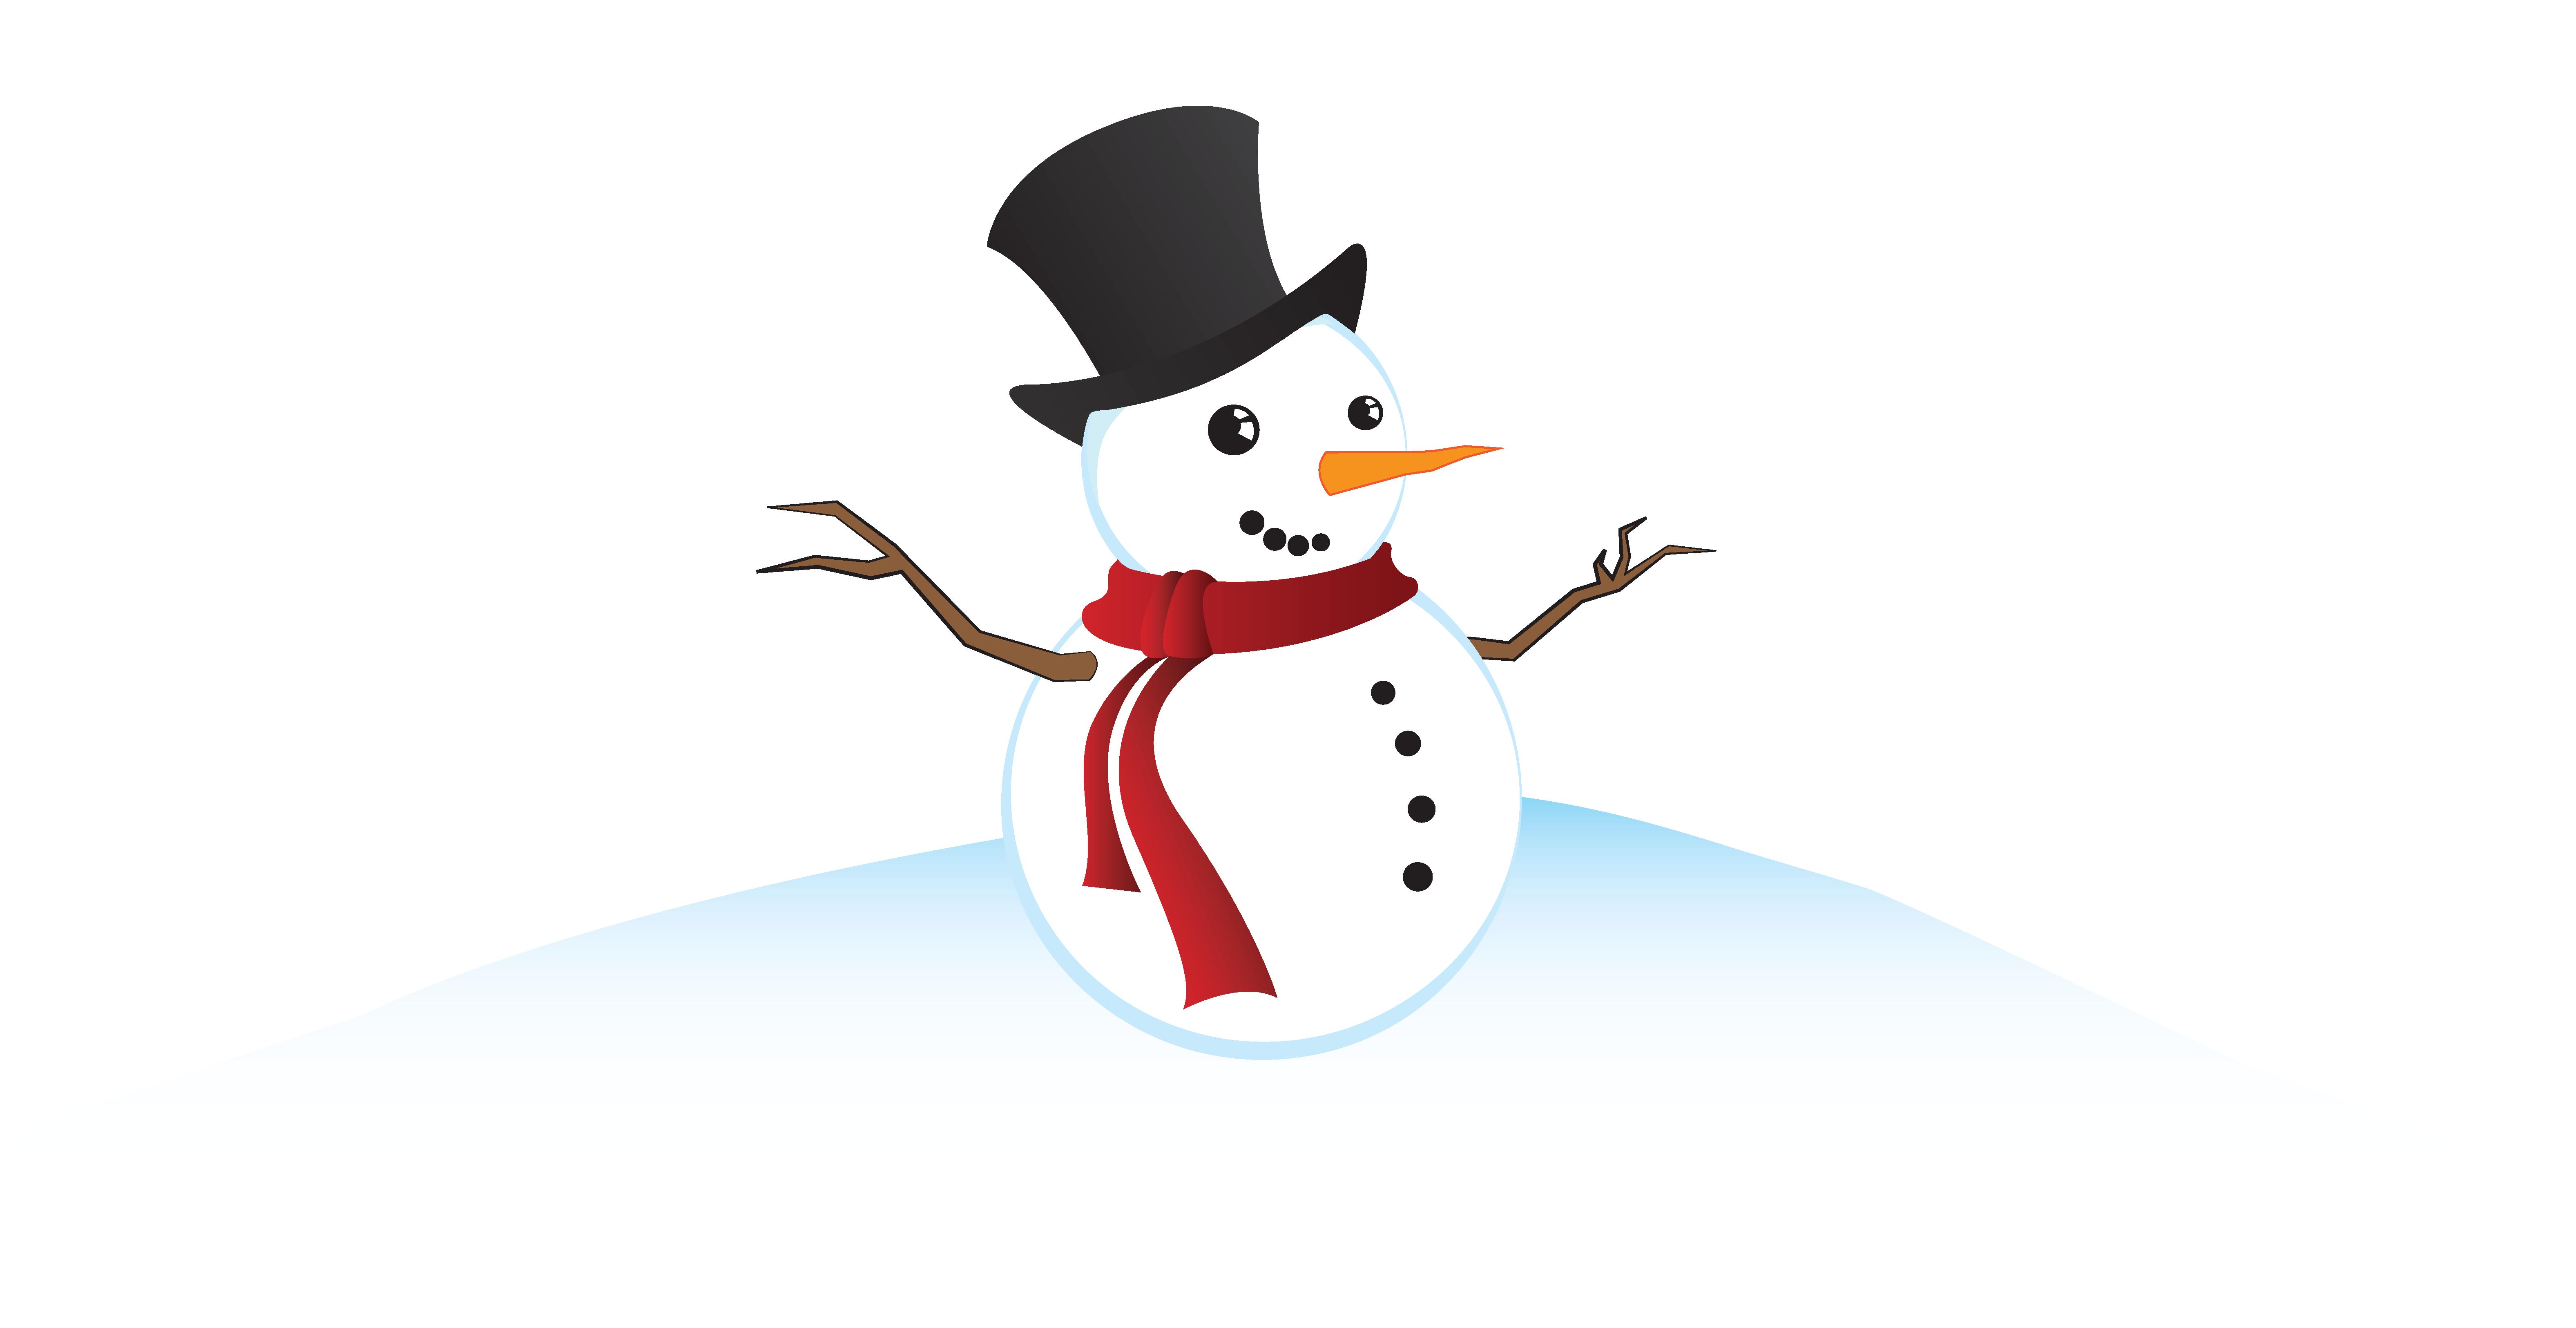 clip art freeuse download Clap clipart remarkable. The great snowman building.